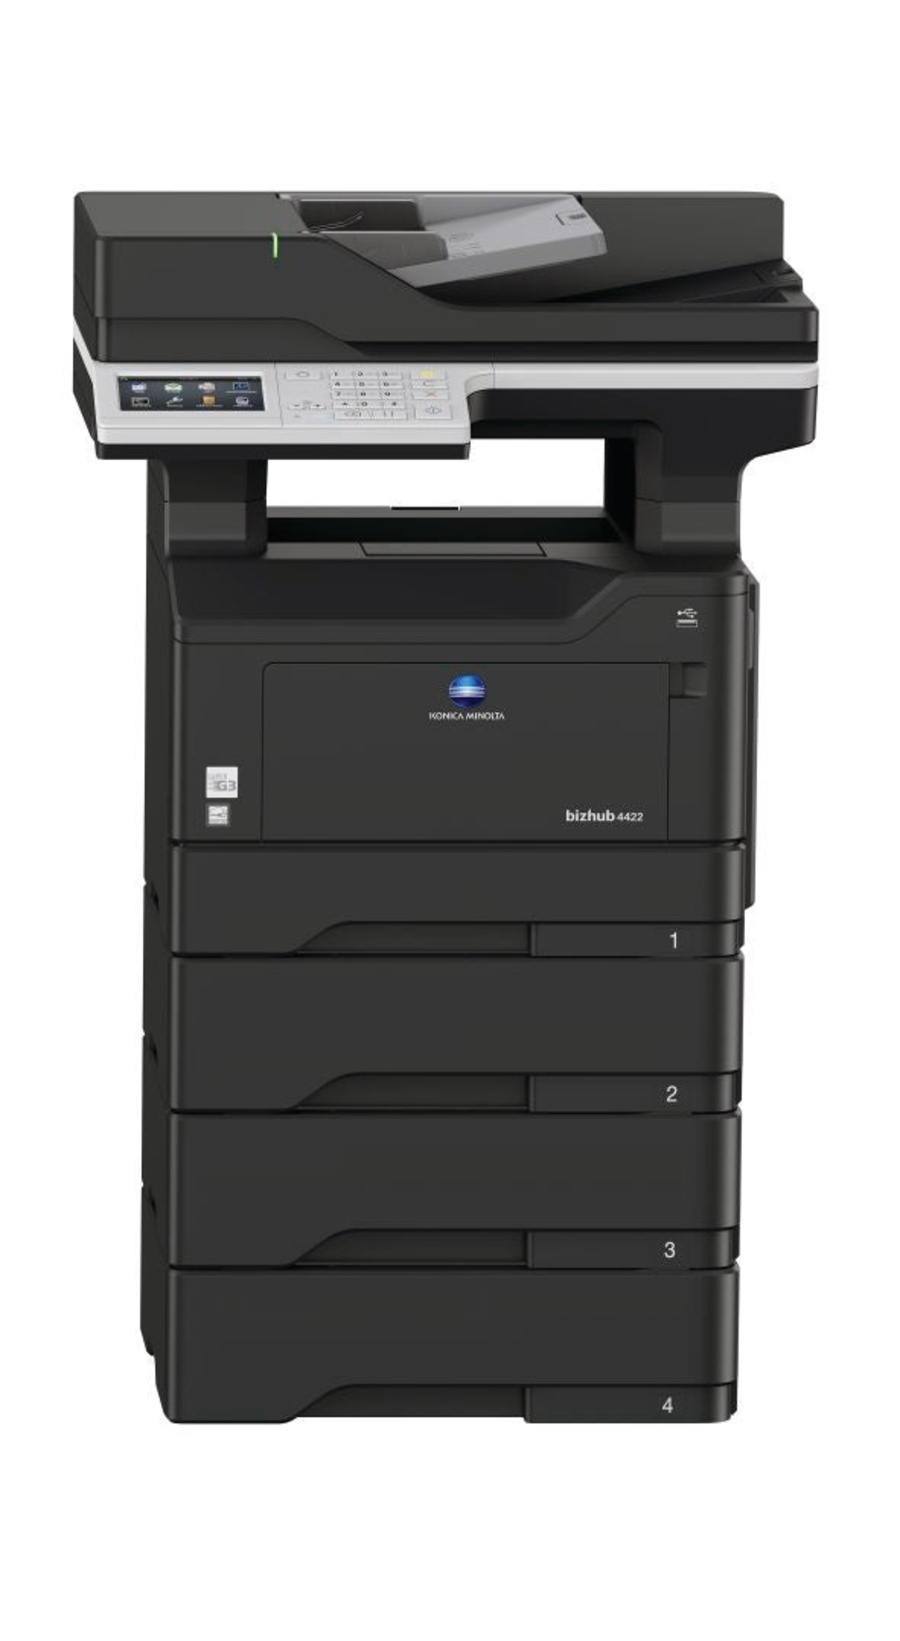 Konica Minolta bizhub 4422 офисный принтер